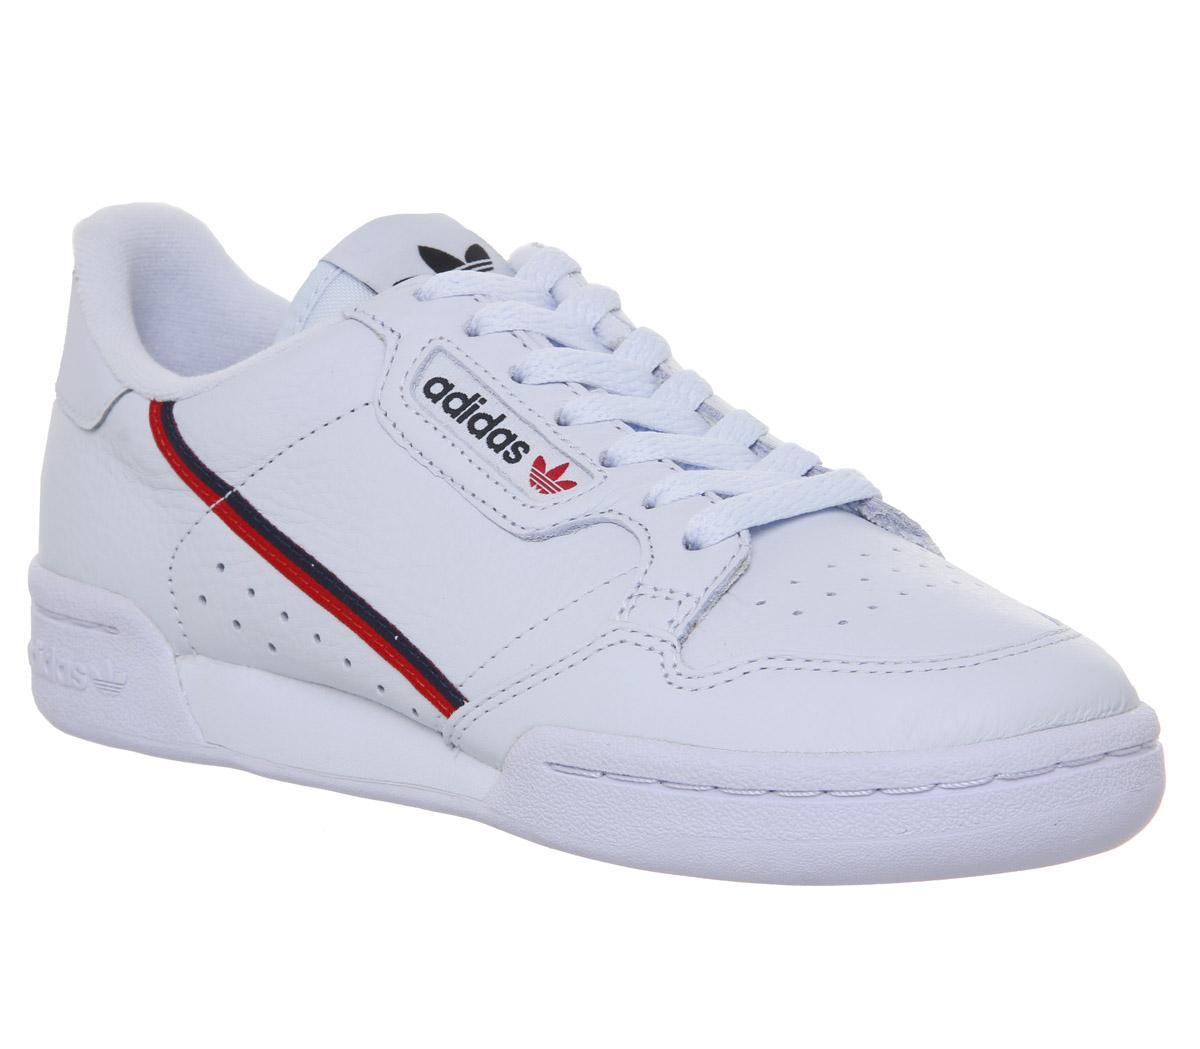 adidas Continental 80s Trainers Aero